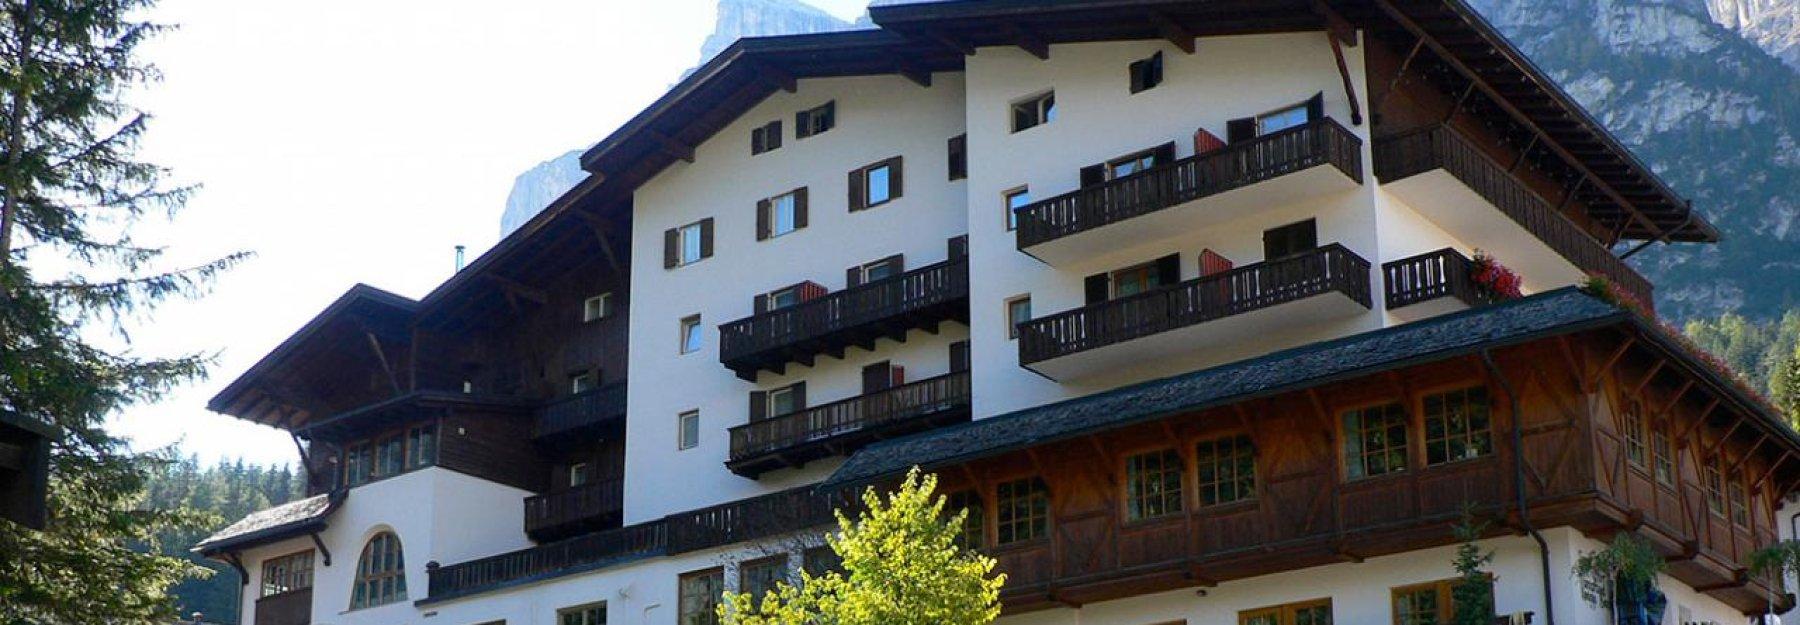 Dolomiti ski weeks dal 6 gennaio 2019 al 16 marzo 2019 e for Family hotel dolomiti